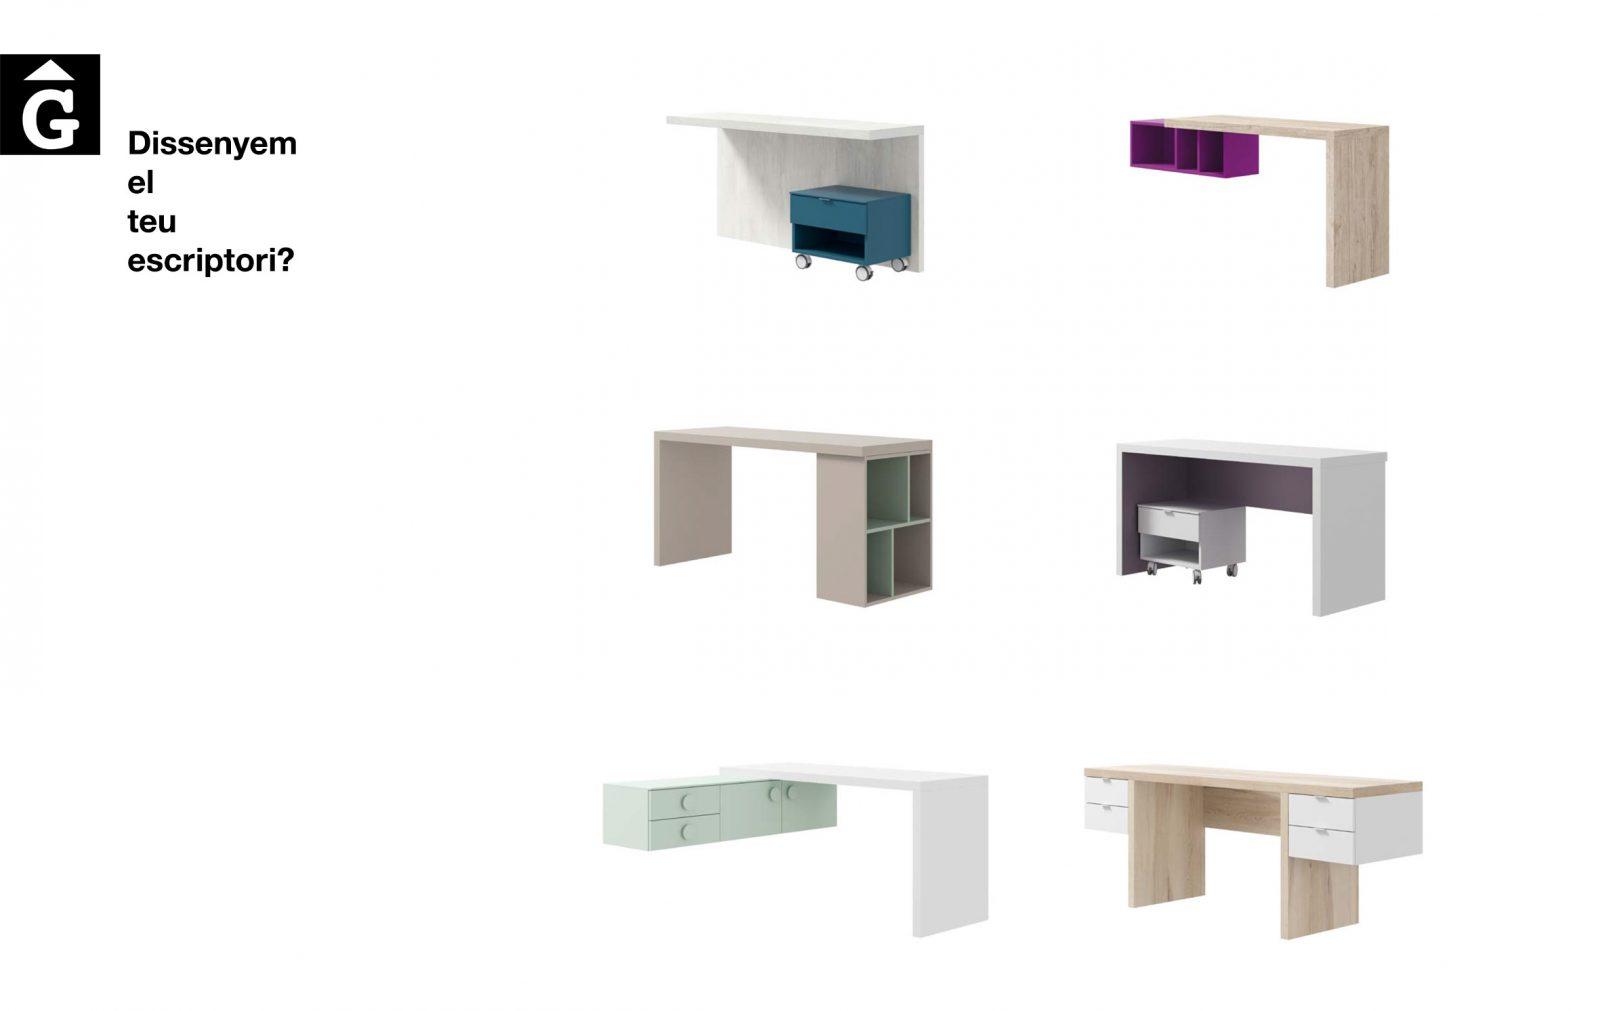 20 2 Dissenyem el teu escriptori QB NEXT Tegar by nobles GIFREU Girona modern minim elegant atemporal